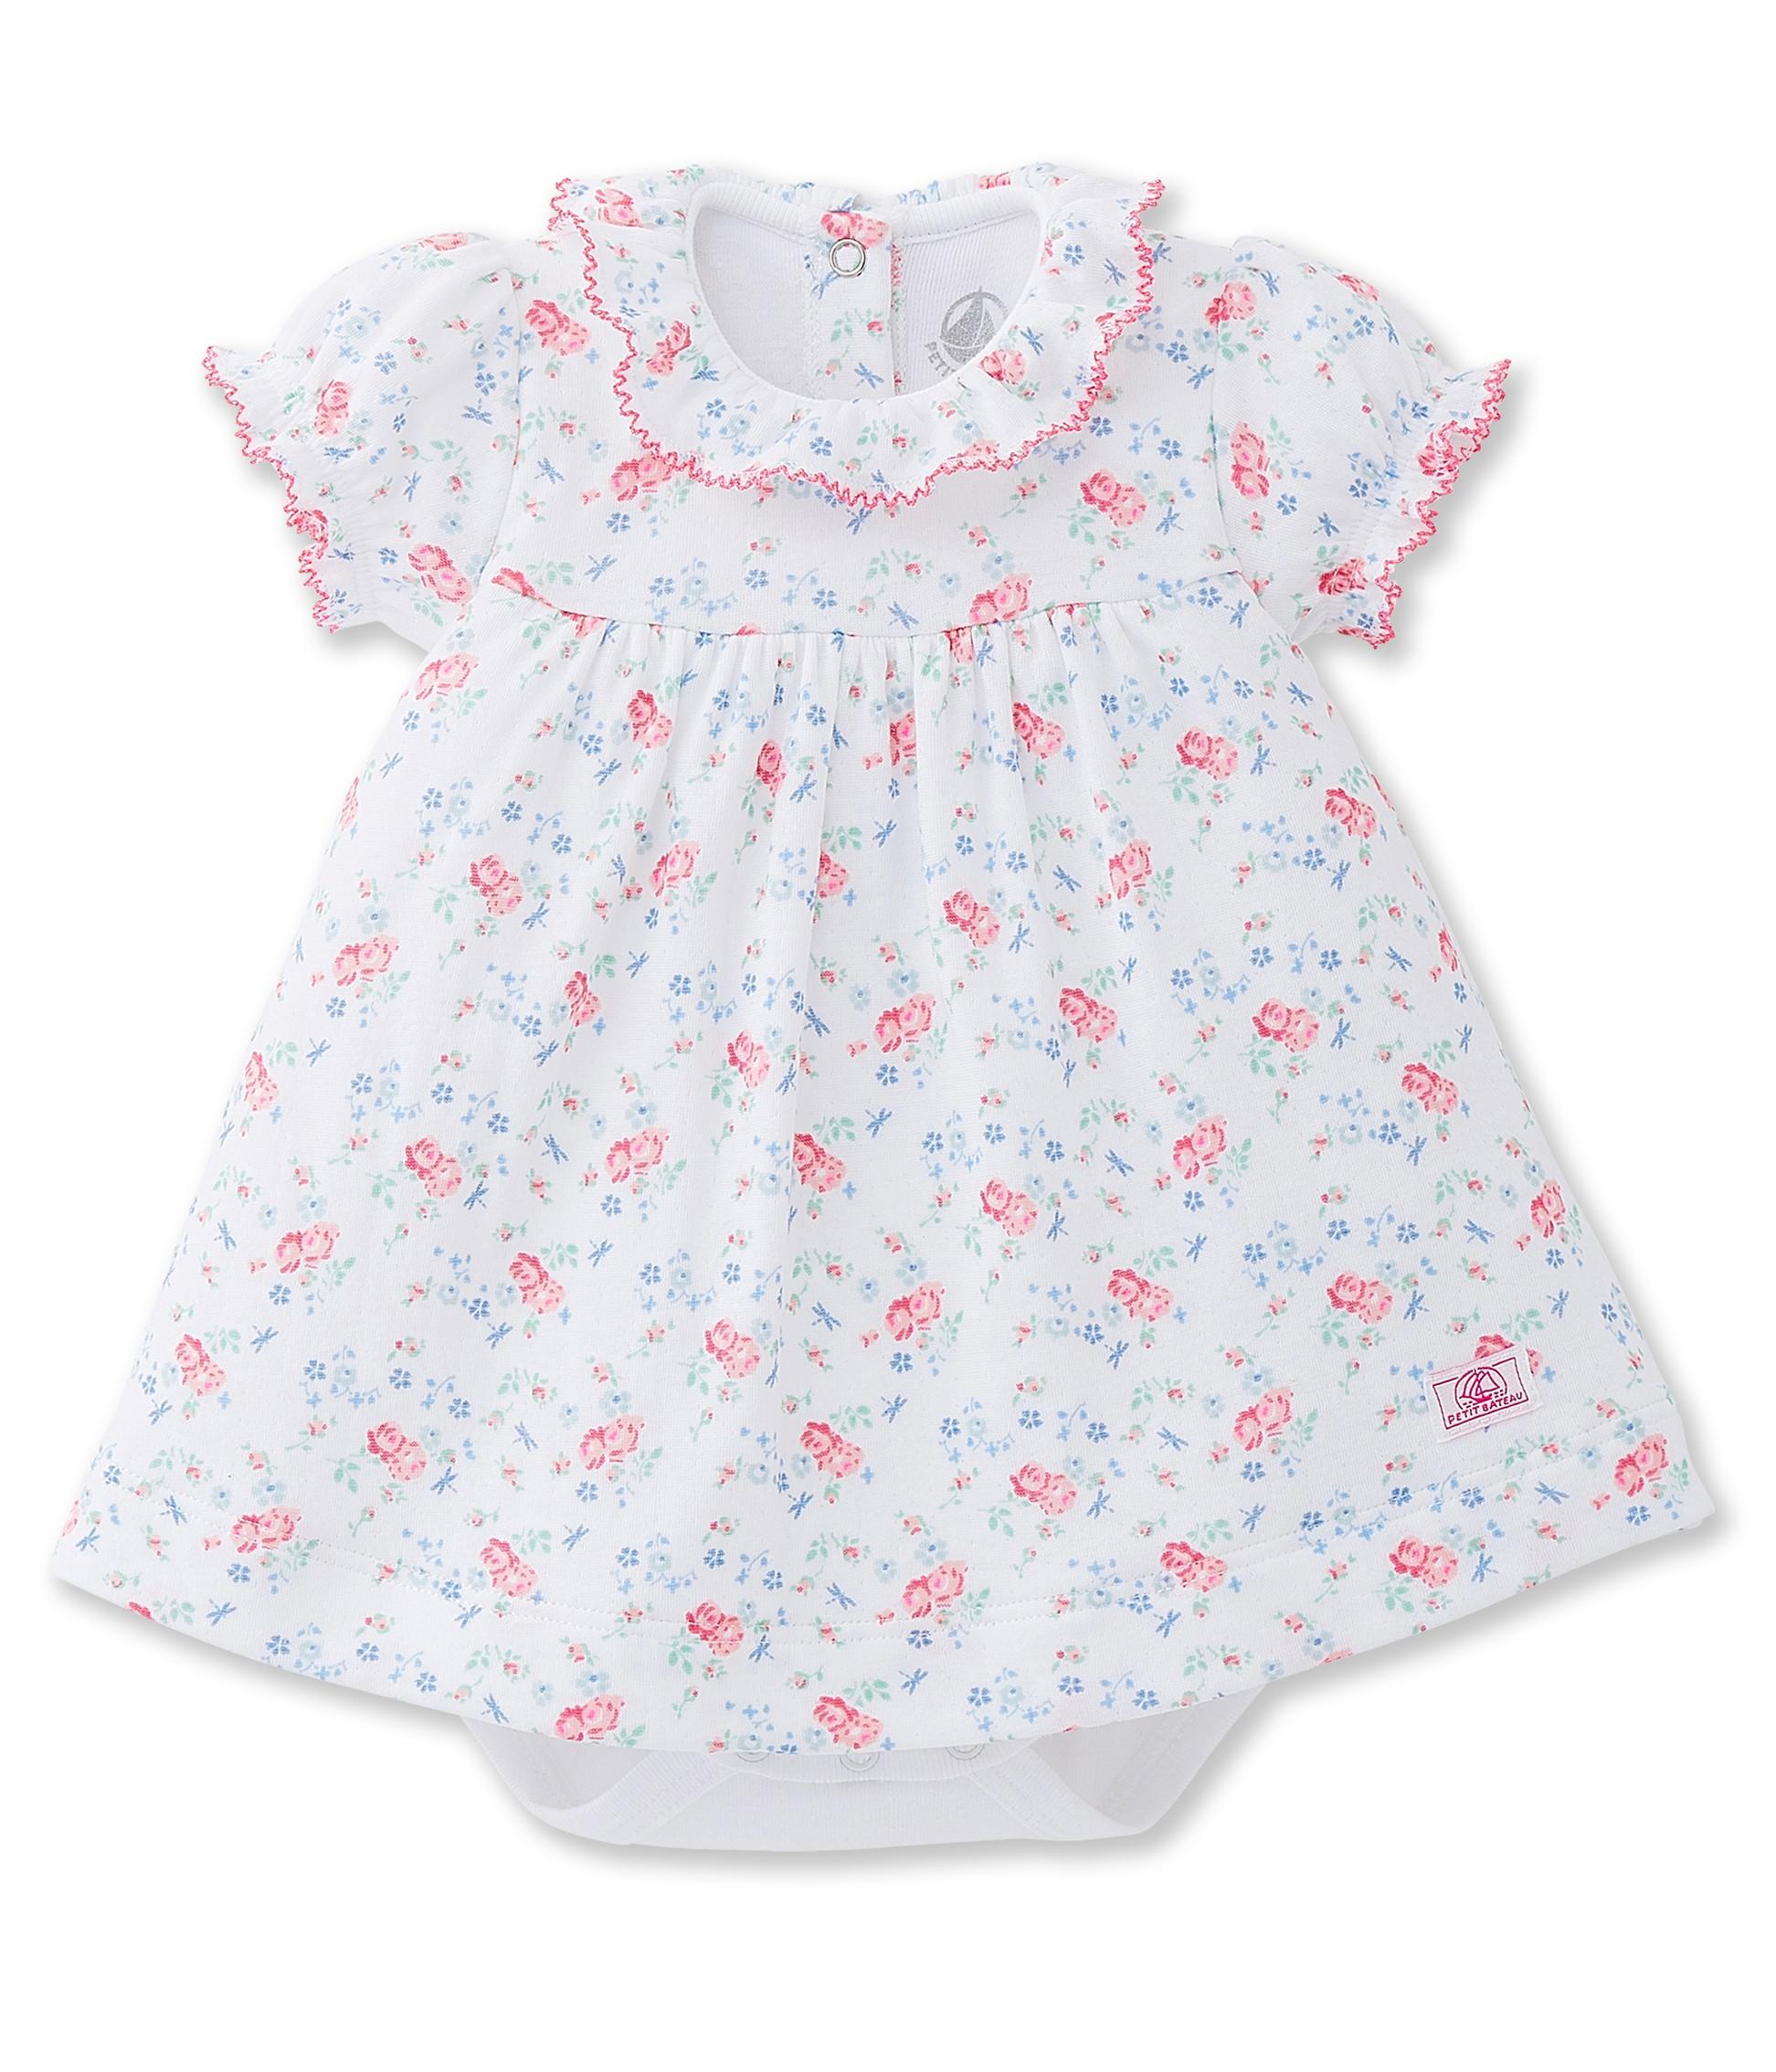 059cf5f9cf2 Φόρεμα με σχέδιο από μαλακό βαμβάκι και ενσωματωμένο κορμάκι για μωρό  κορίτσι